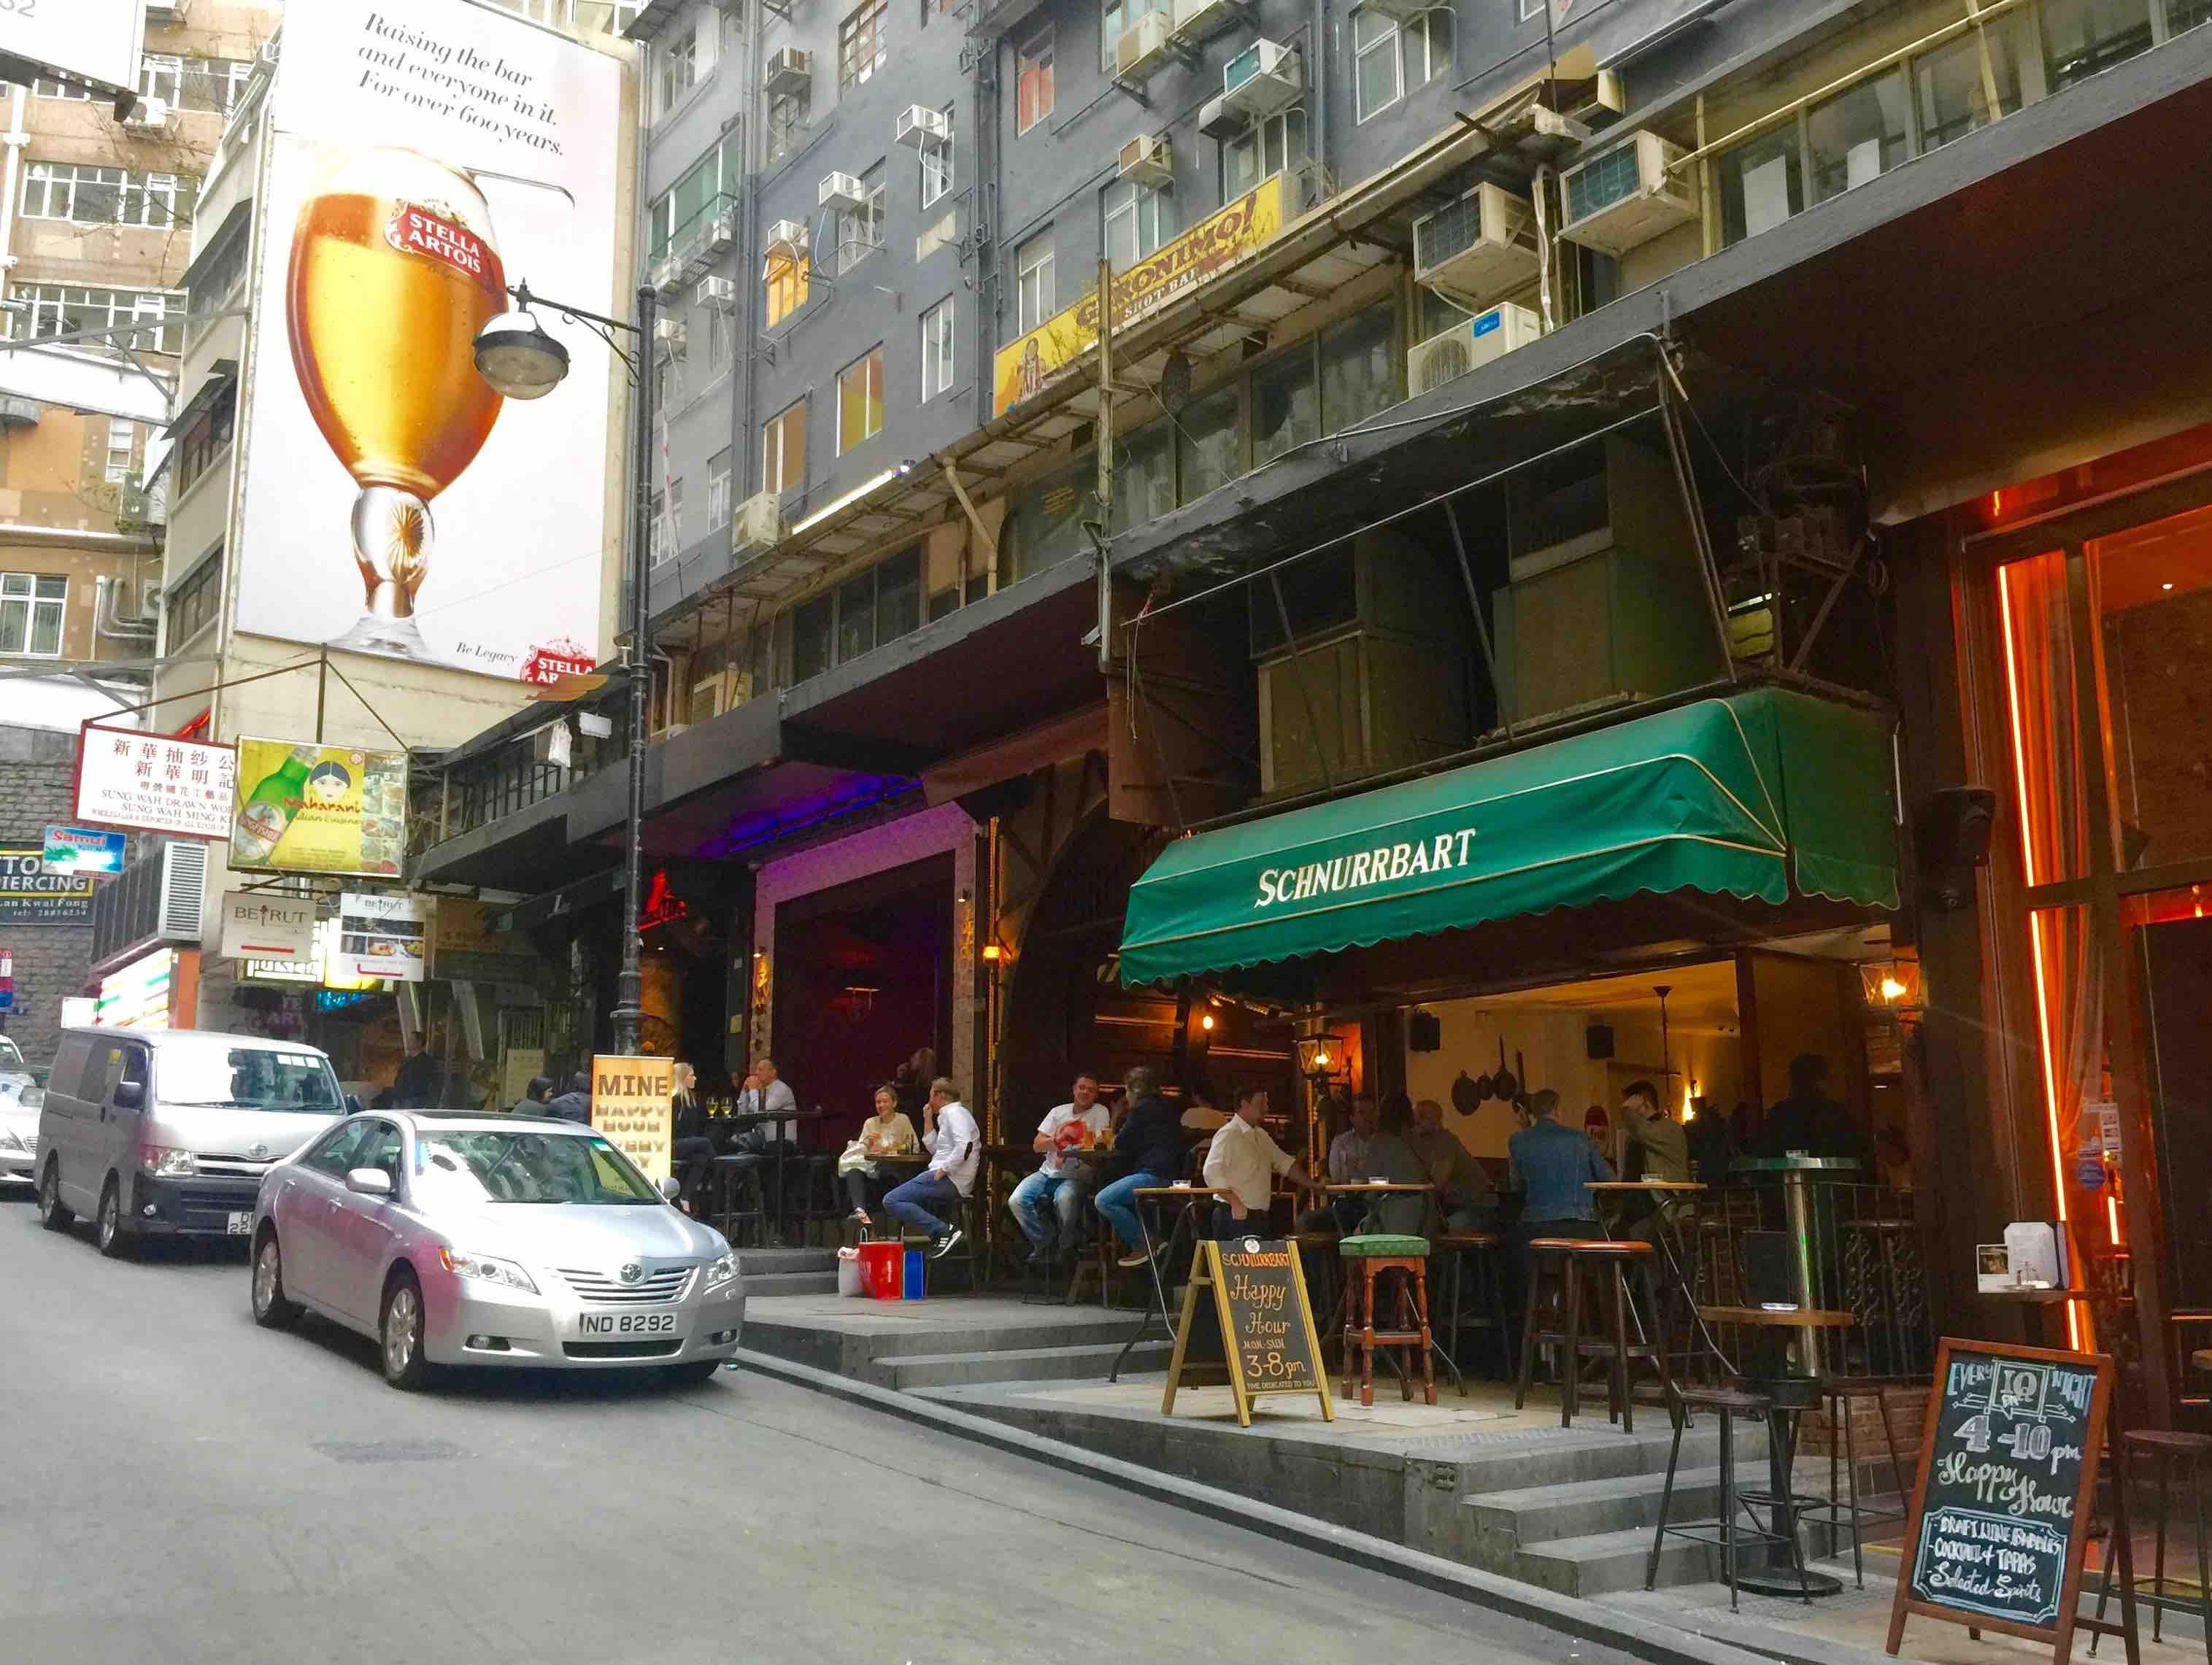 Wyndham Street_extension of bar street from Lan Kwai Fong